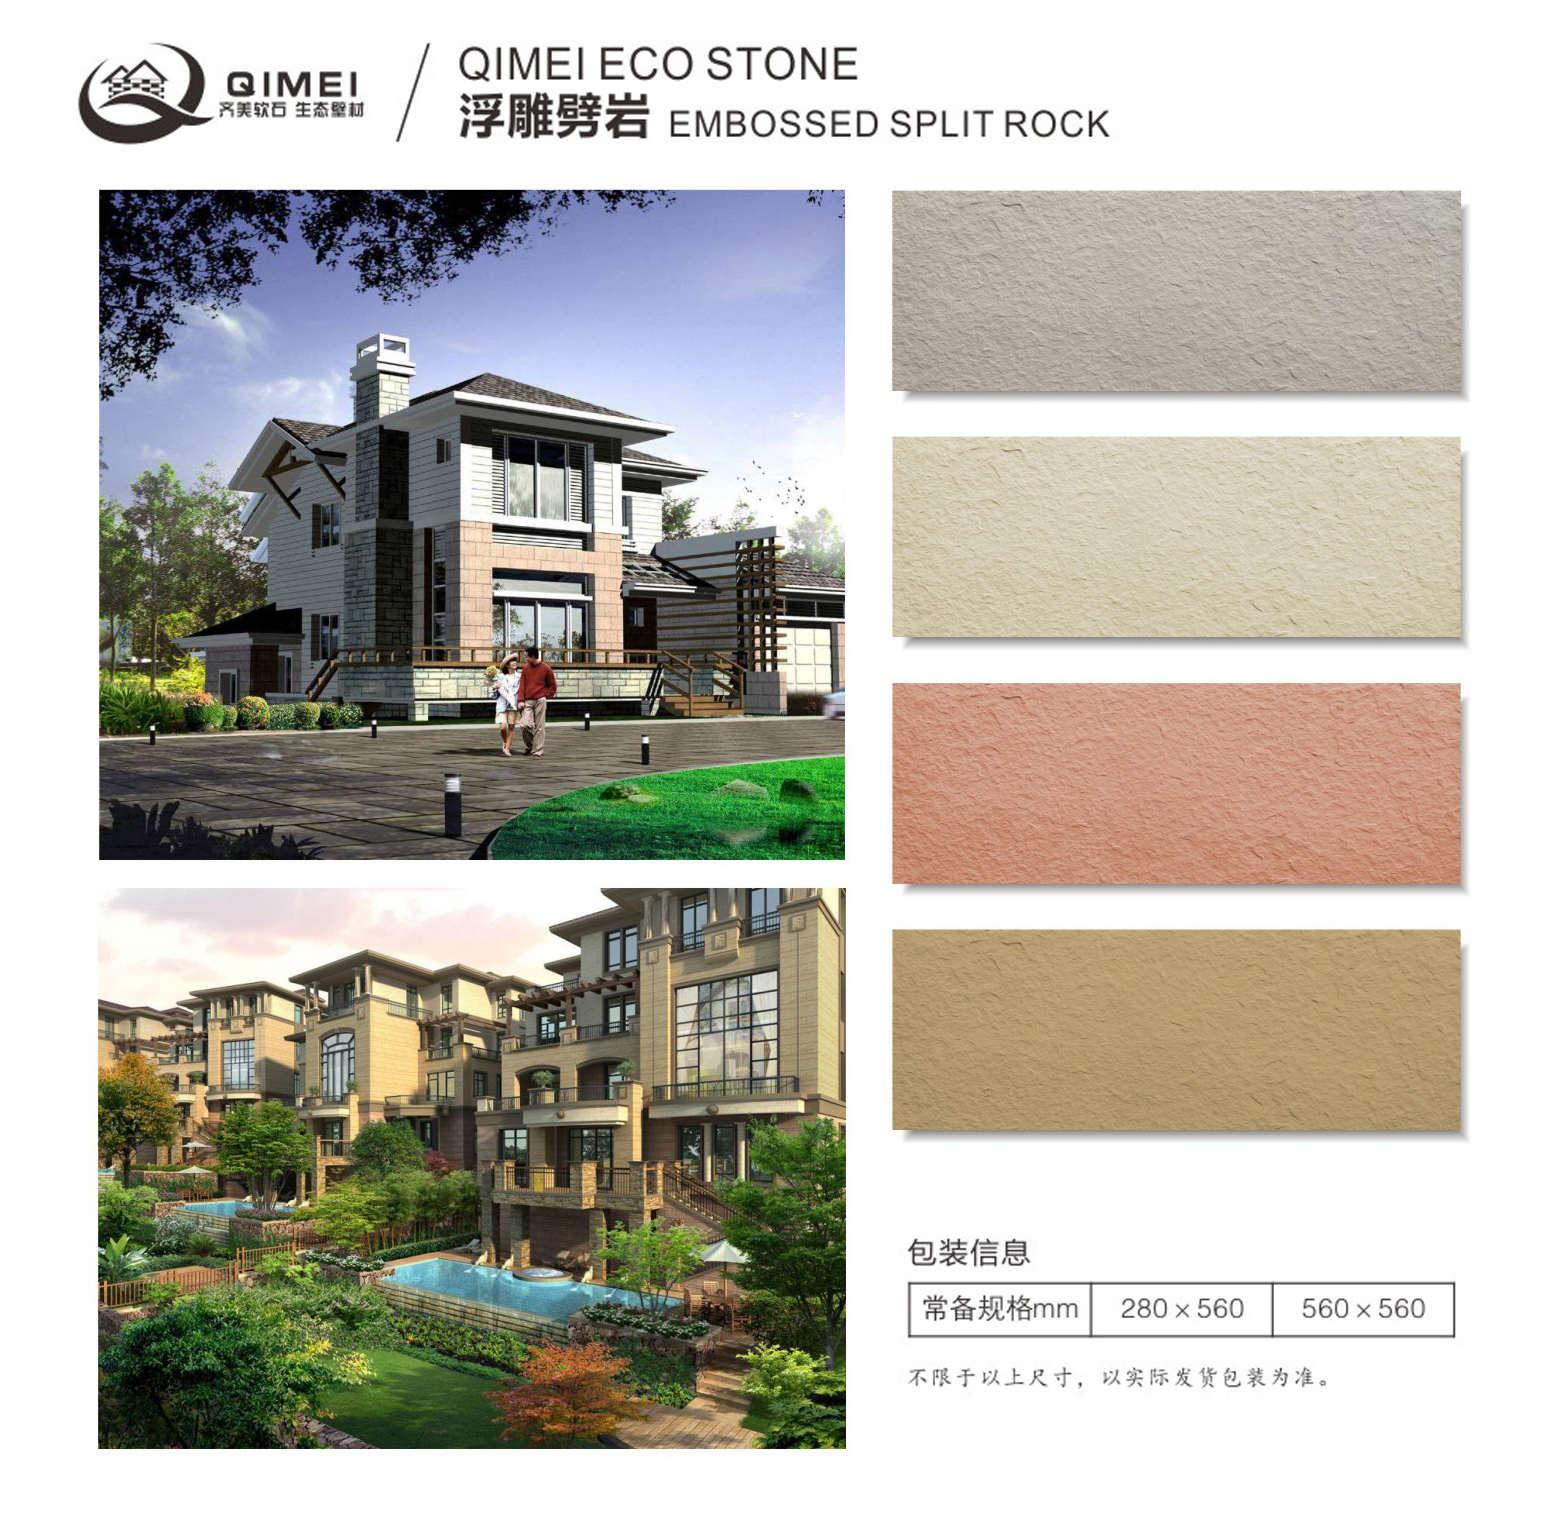 china embossed split stone soft and eco stone customized size/style/pattern